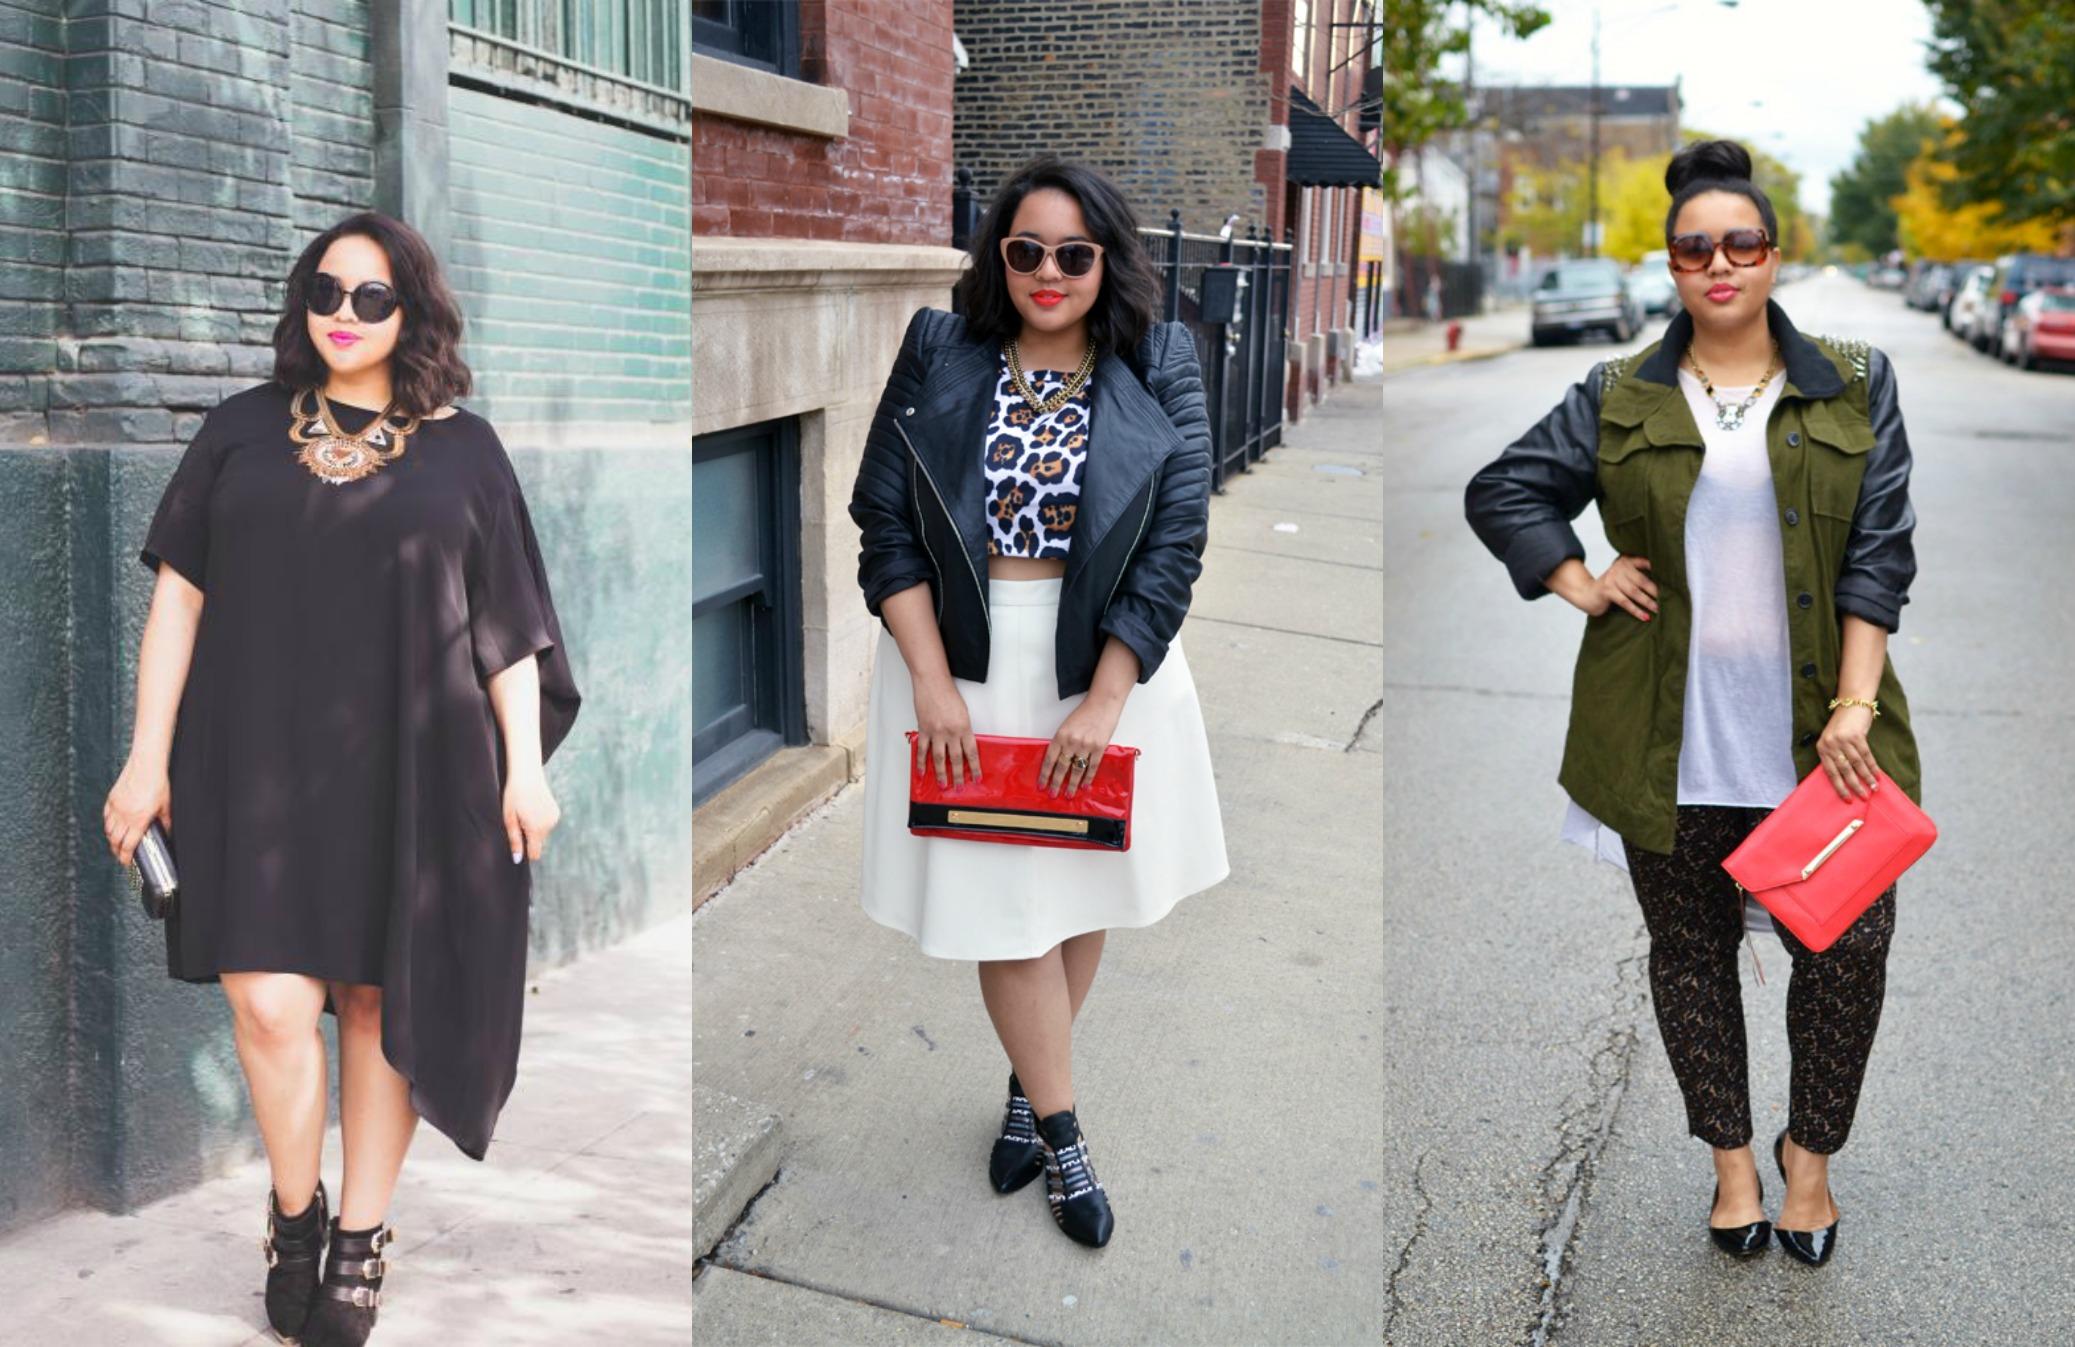 cbded258327 Στρουμπουλή μπλόγκερ μόδας τα καταφέρνει: κάνει τα περιττά κιλά μόδα ...